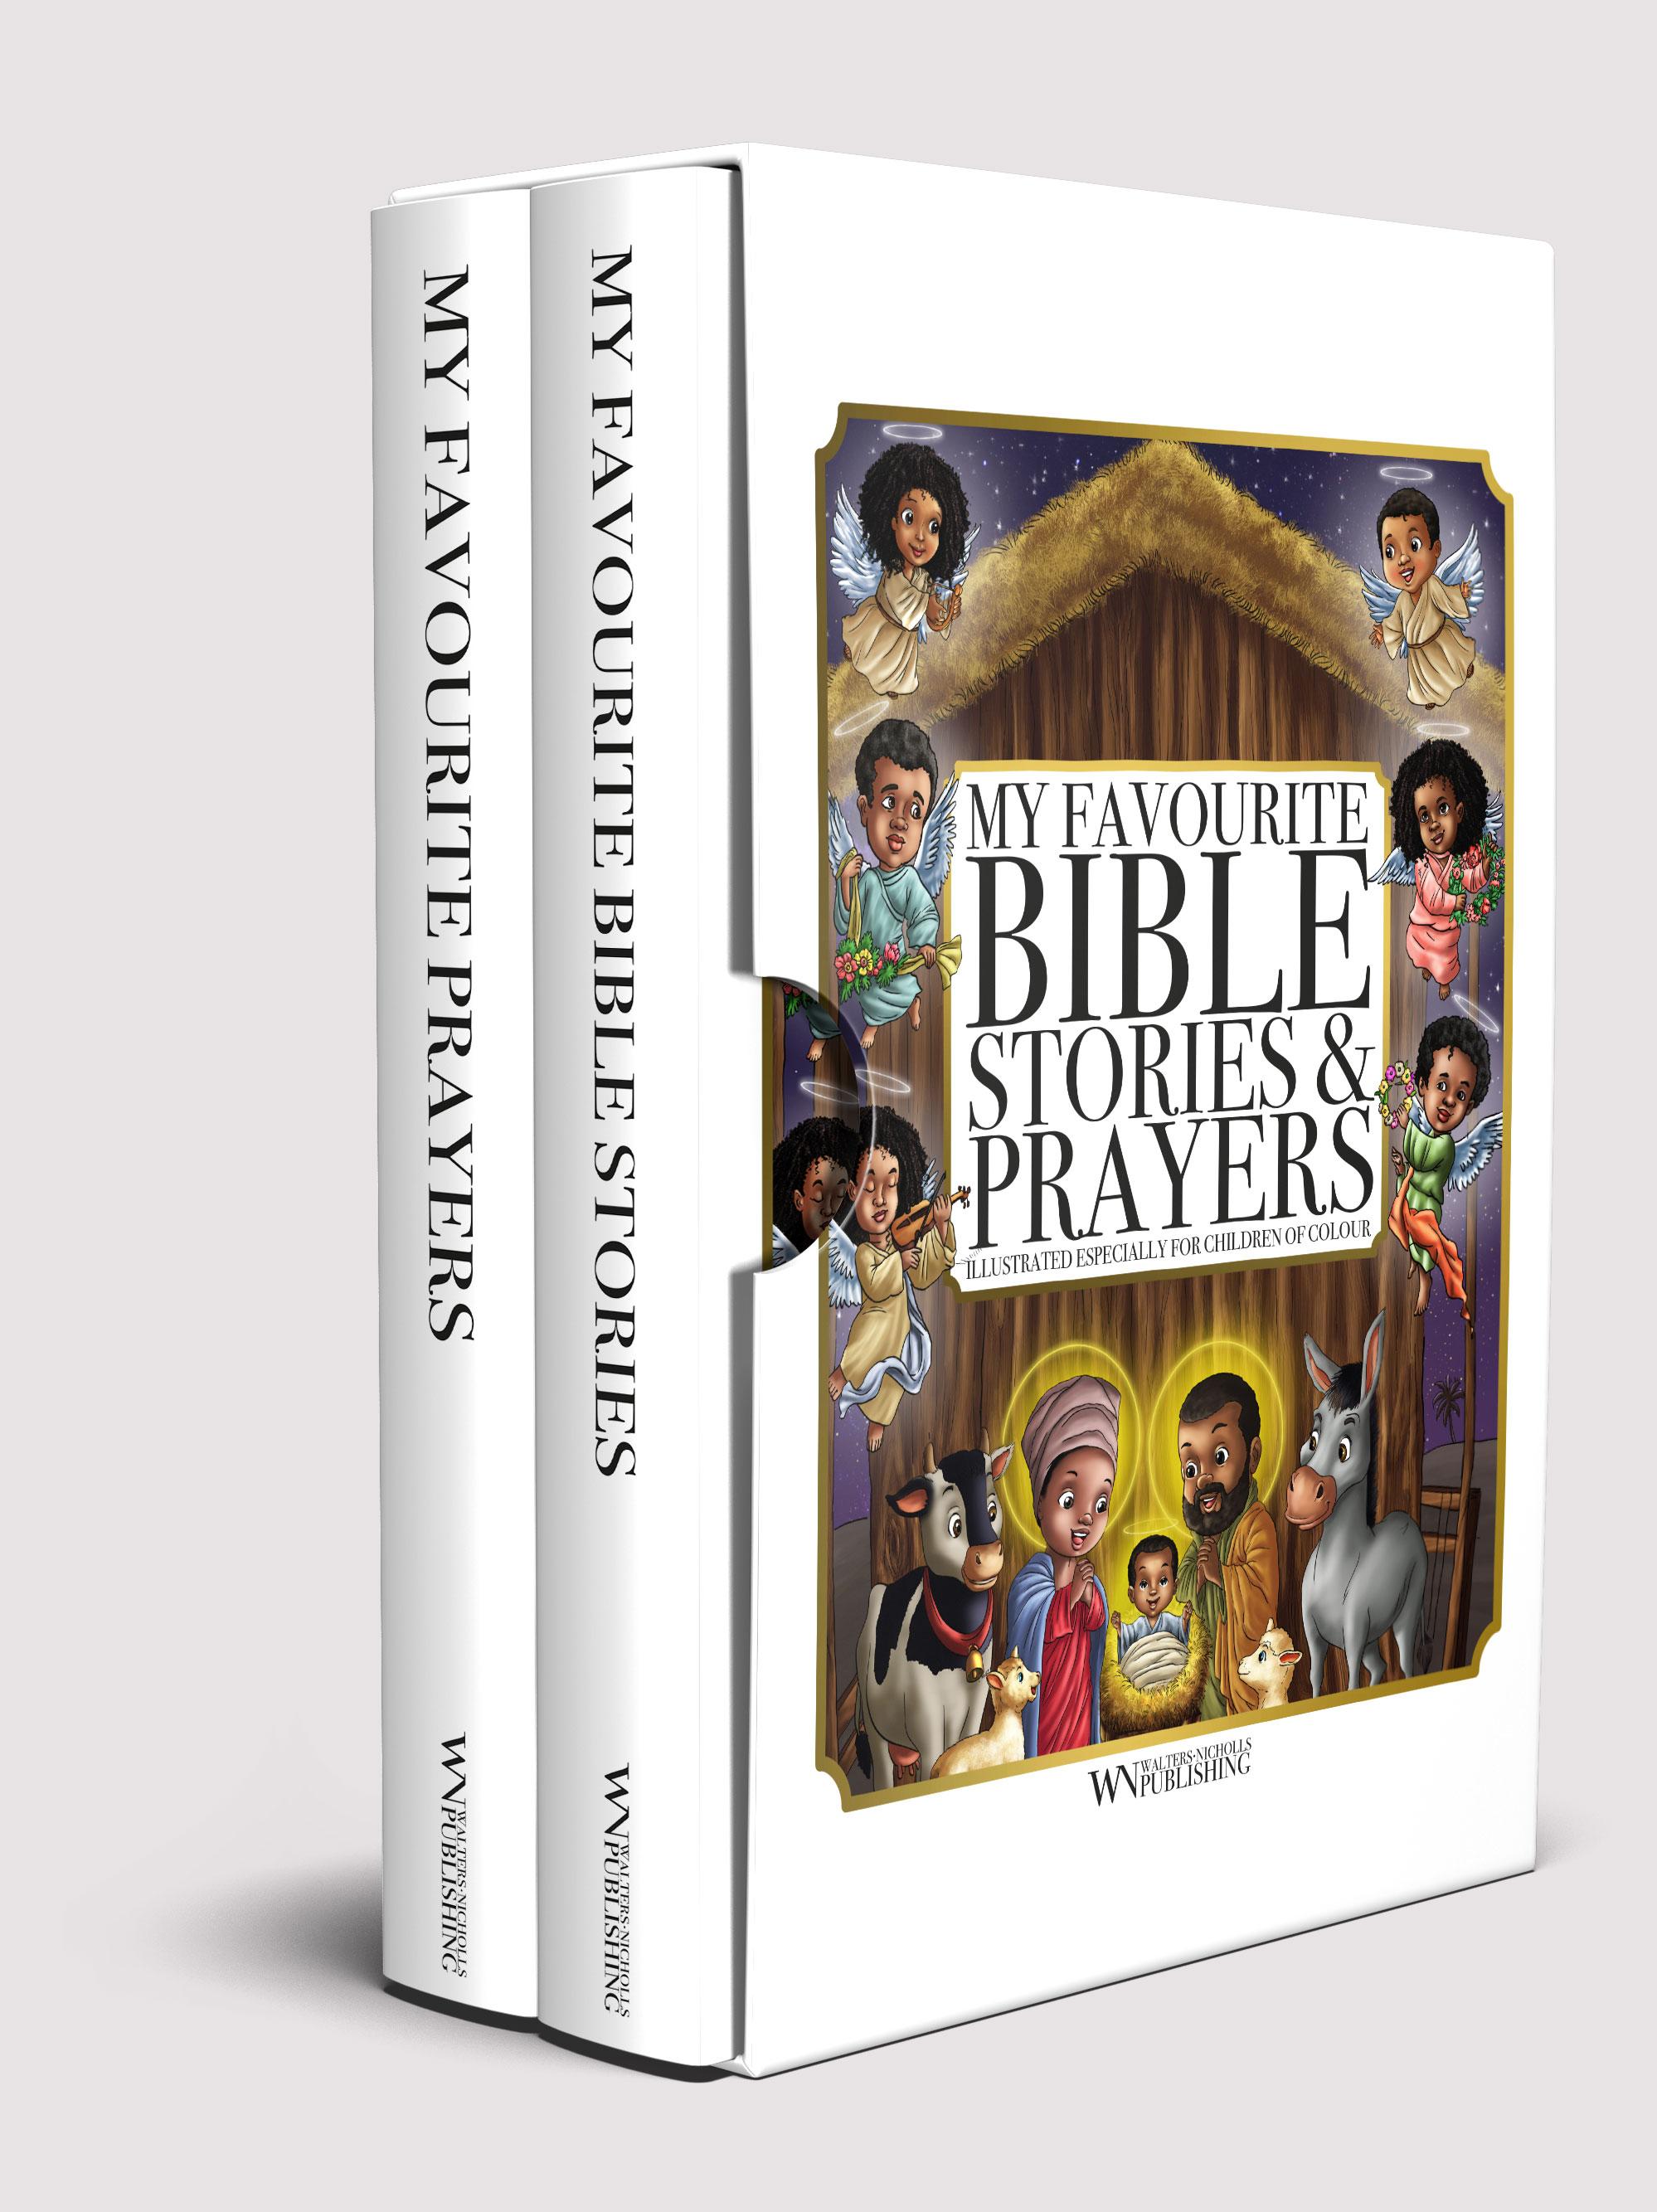 biblestories.jpg